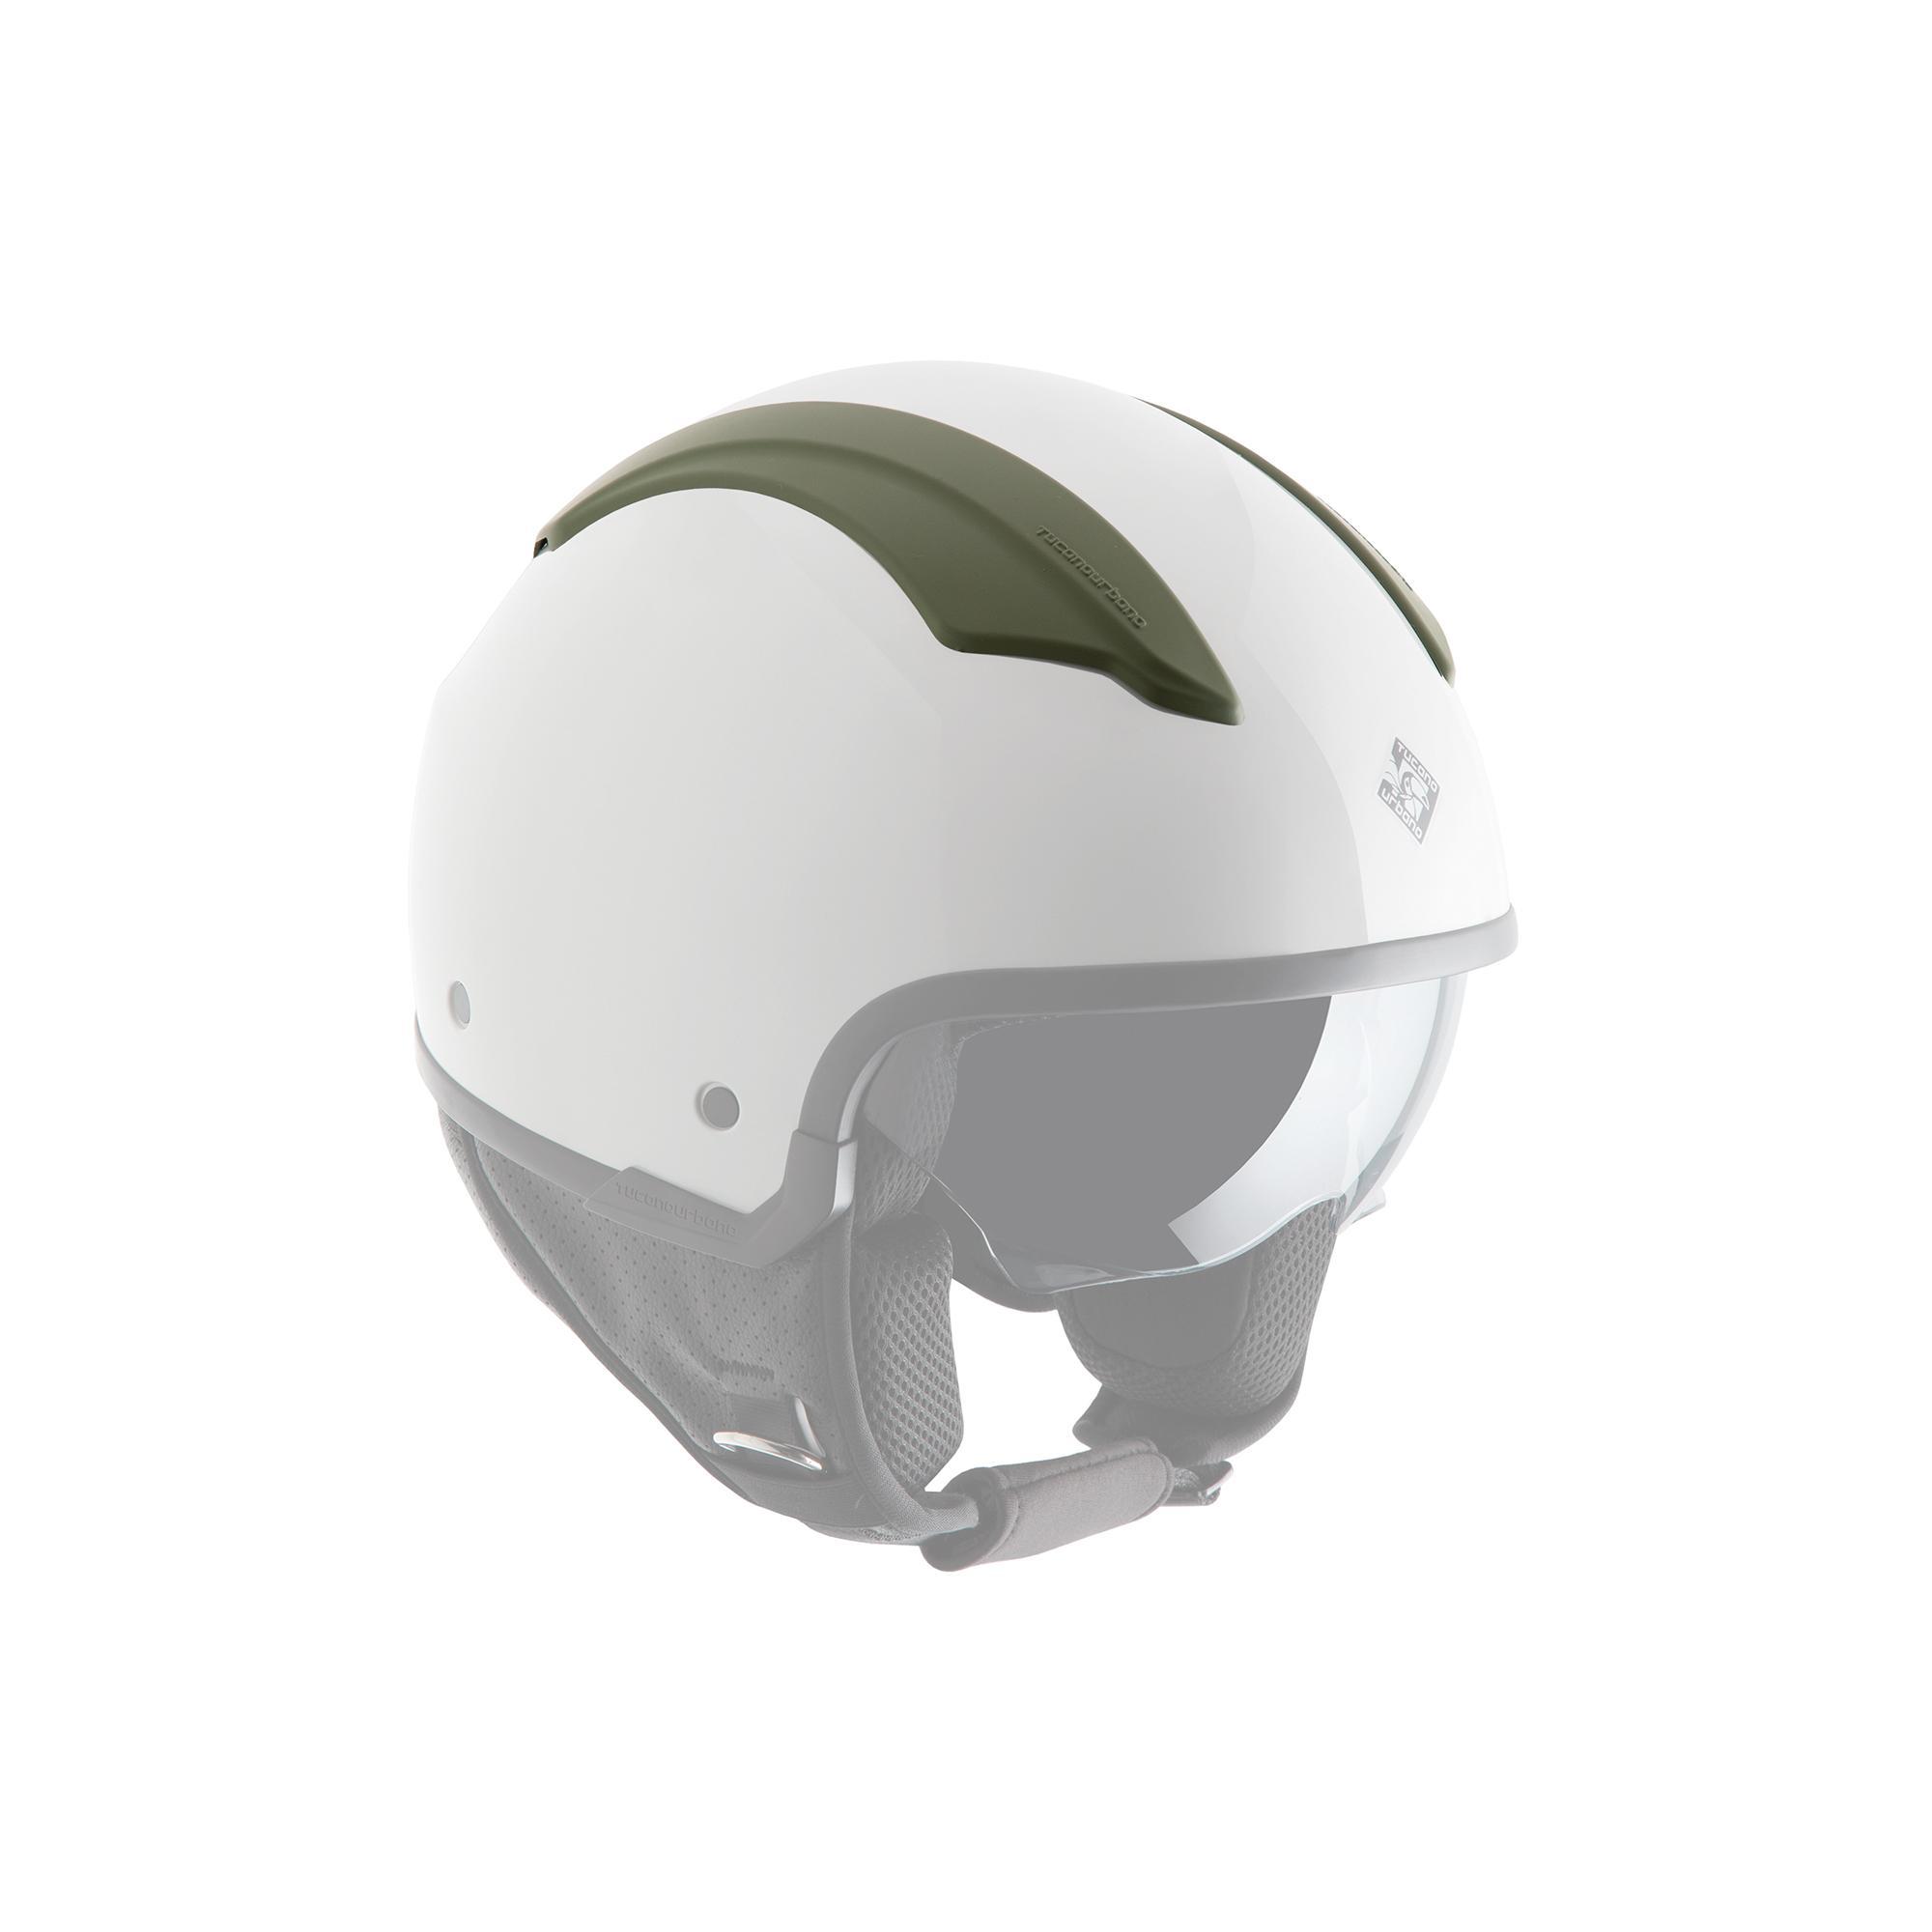 Cover Copri-aerazione Per Casco El'fresh Verde Airborne Opaco